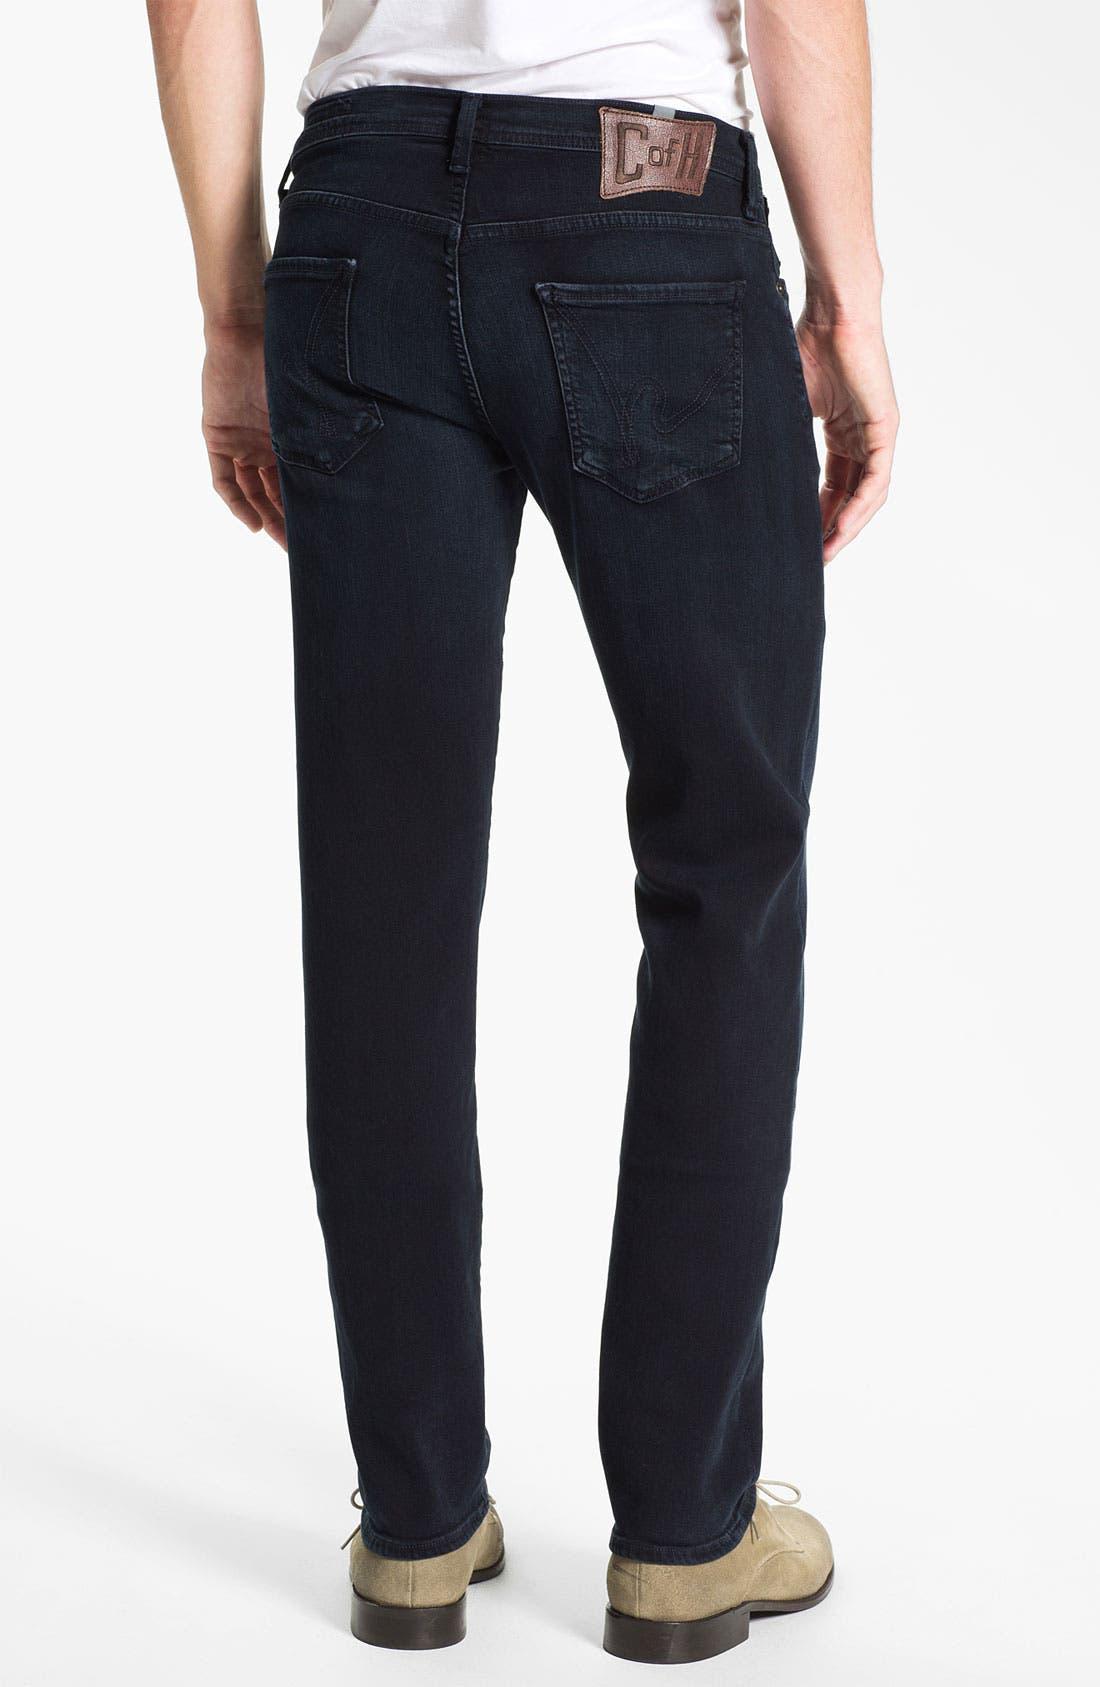 Alternate Image 2  - Citizens of Humanity 'Adonis' Comfort Slim Fit Jeans (Walker Blue)